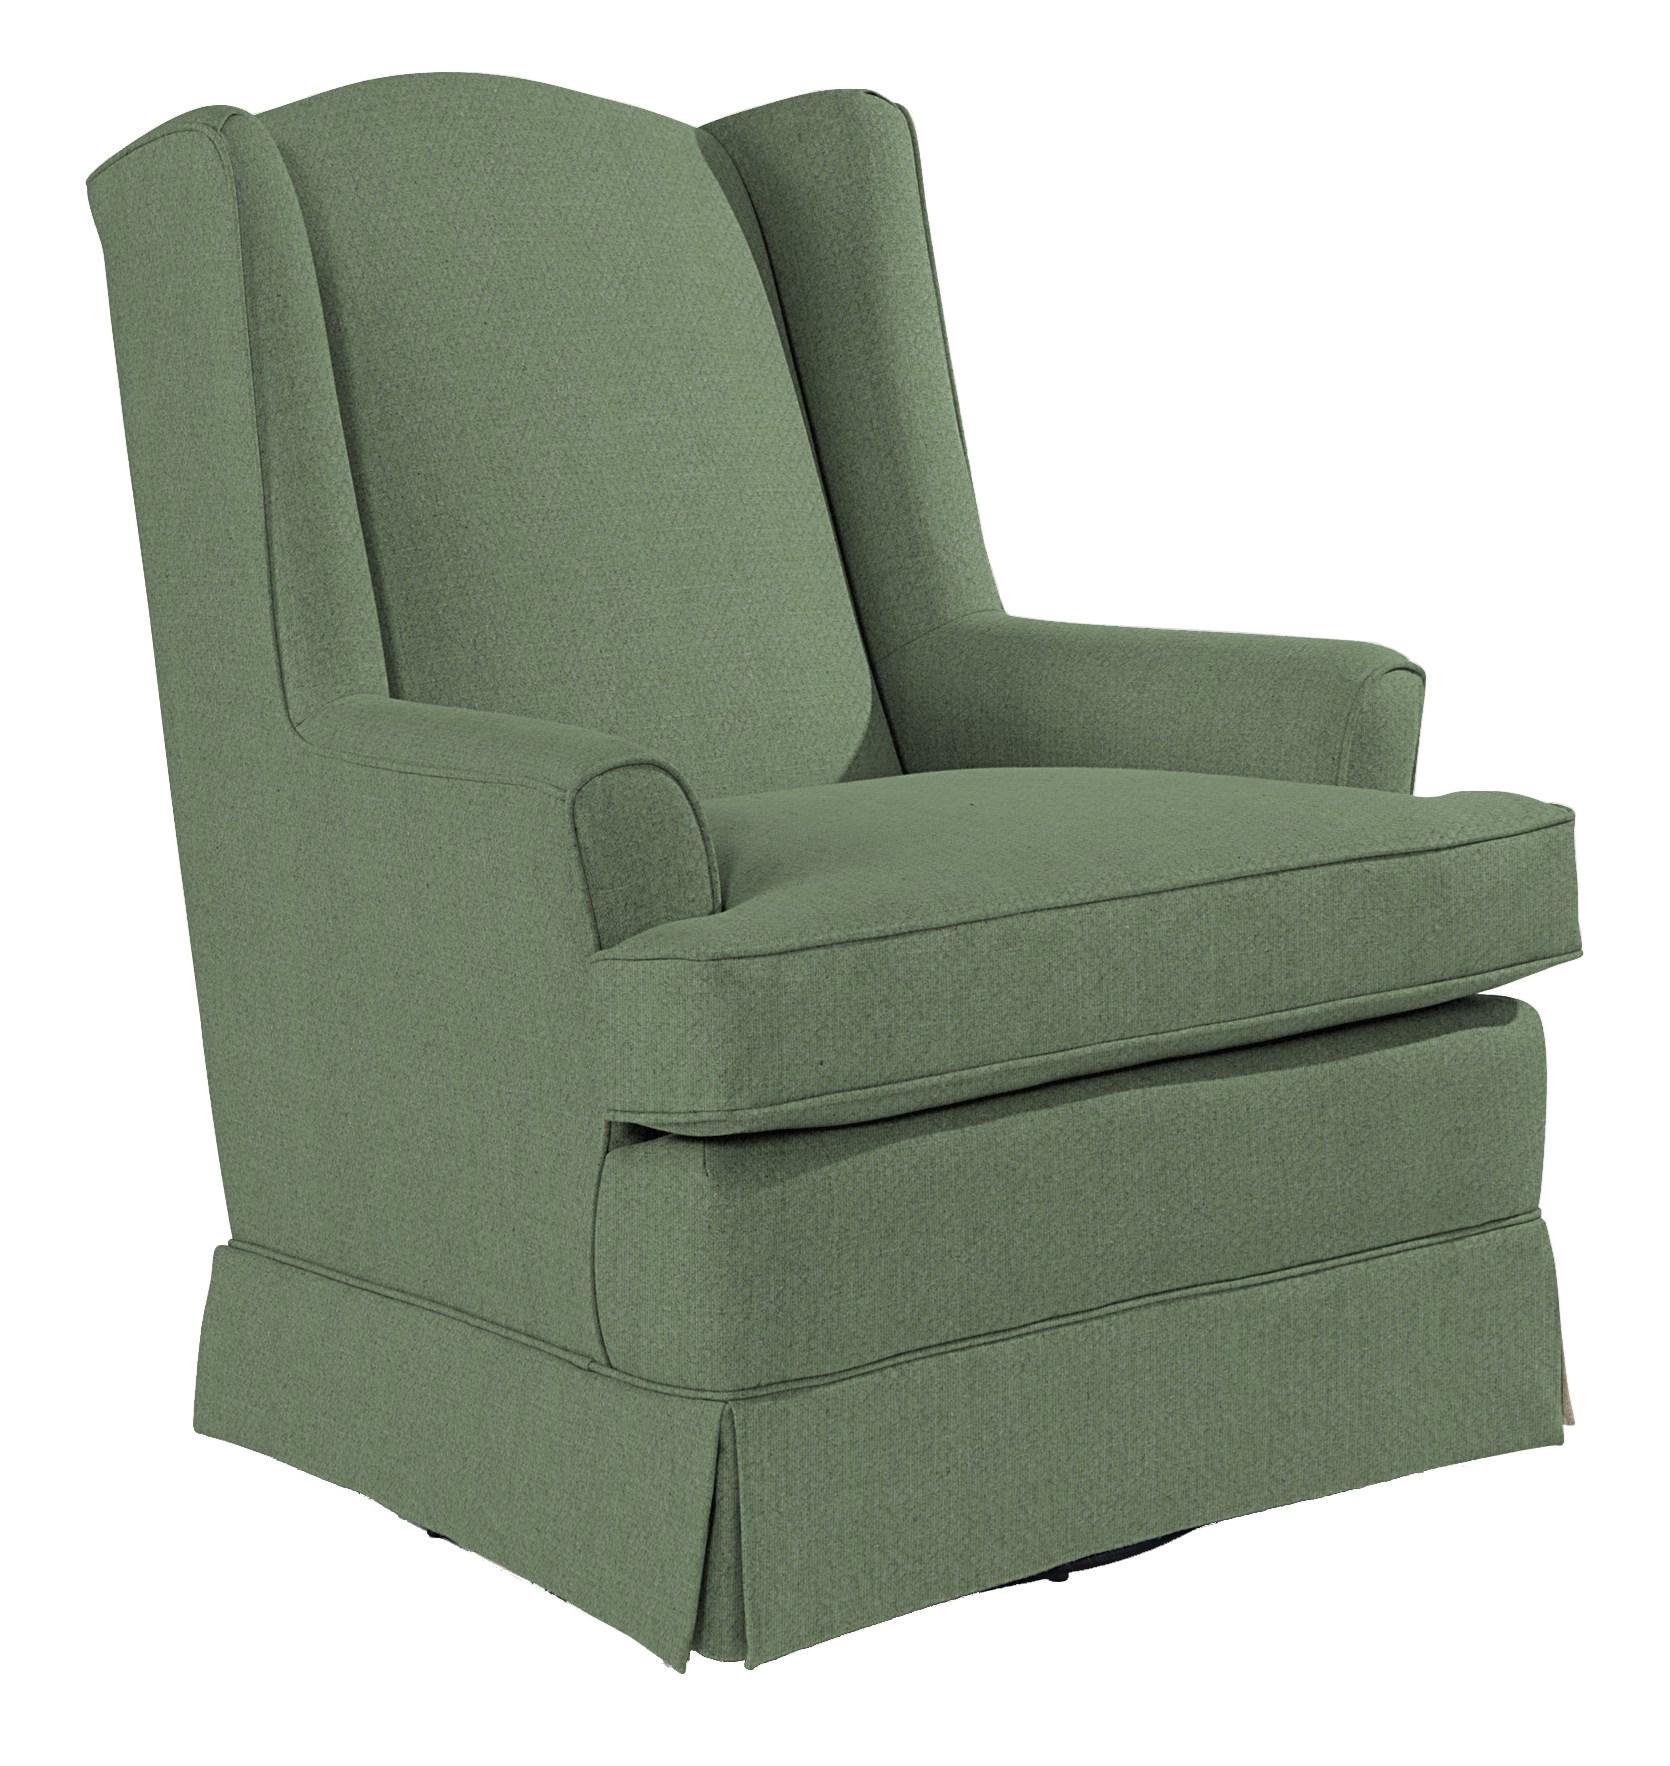 Best Home Furnishings Chairs - Swivel Glide Natasha Swivel Glider - Item Number: 7147-20021